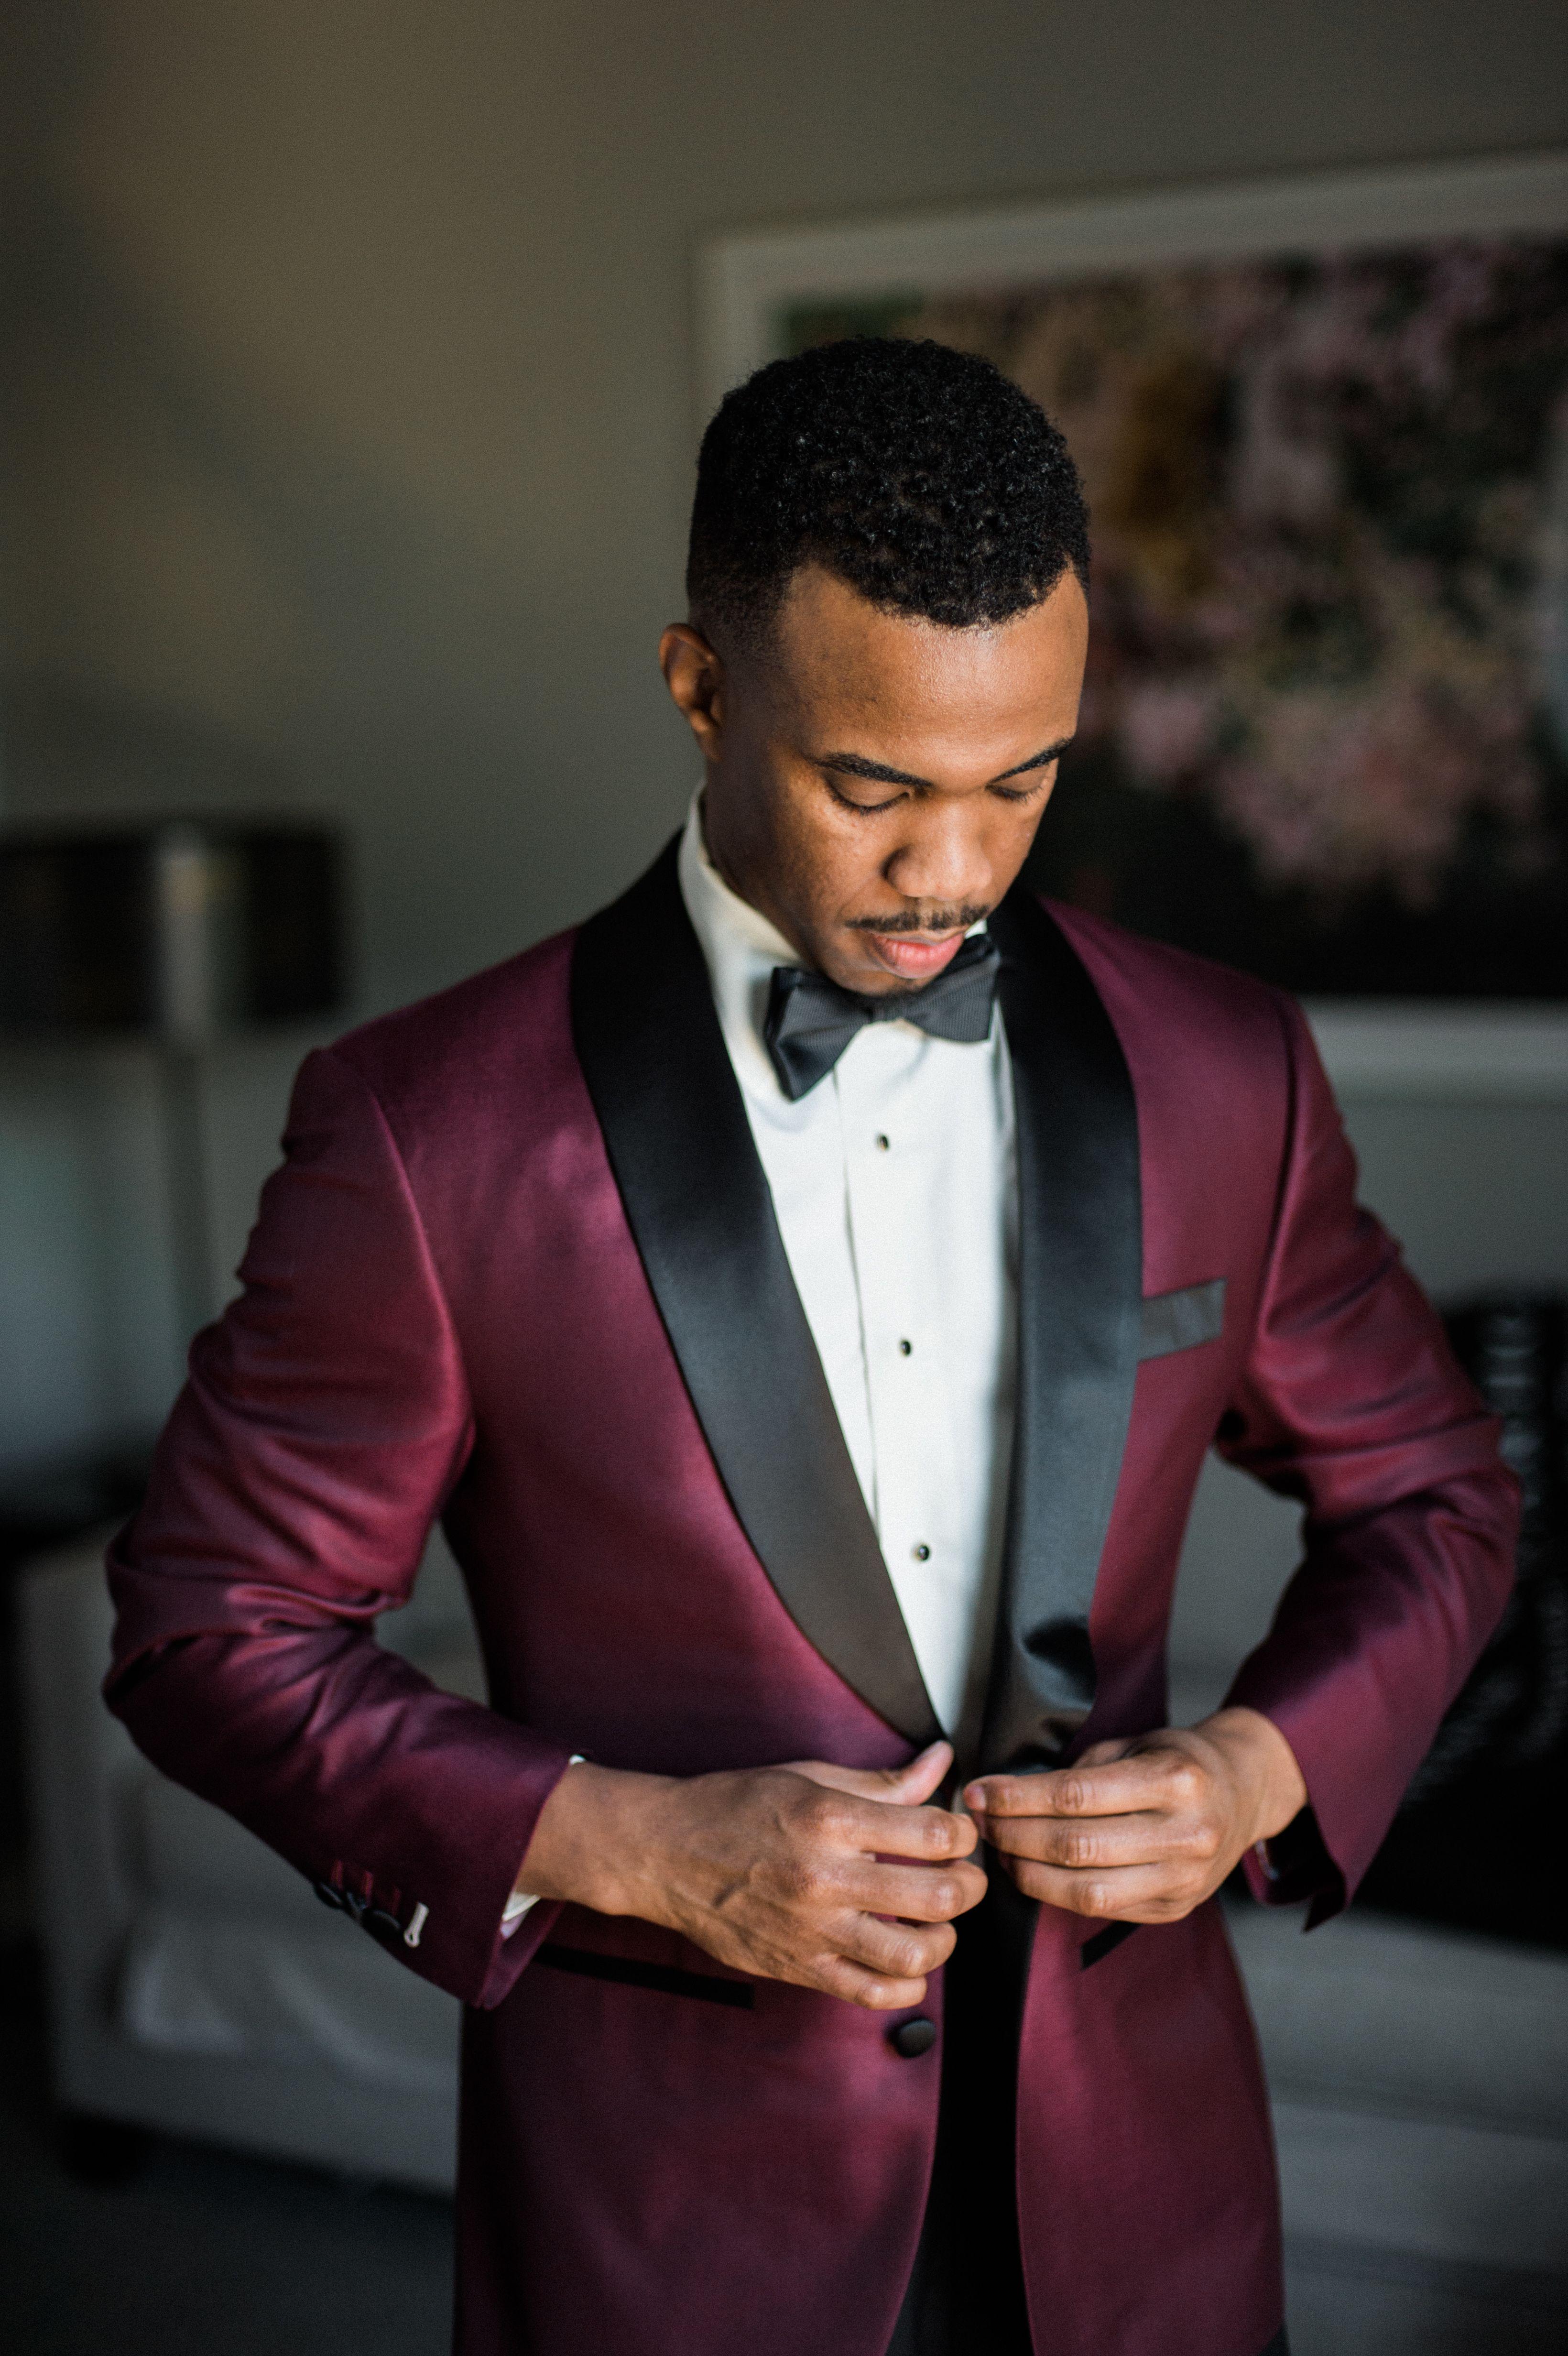 Burgundy tuxedo jacket groom attire burgundy tuxedo